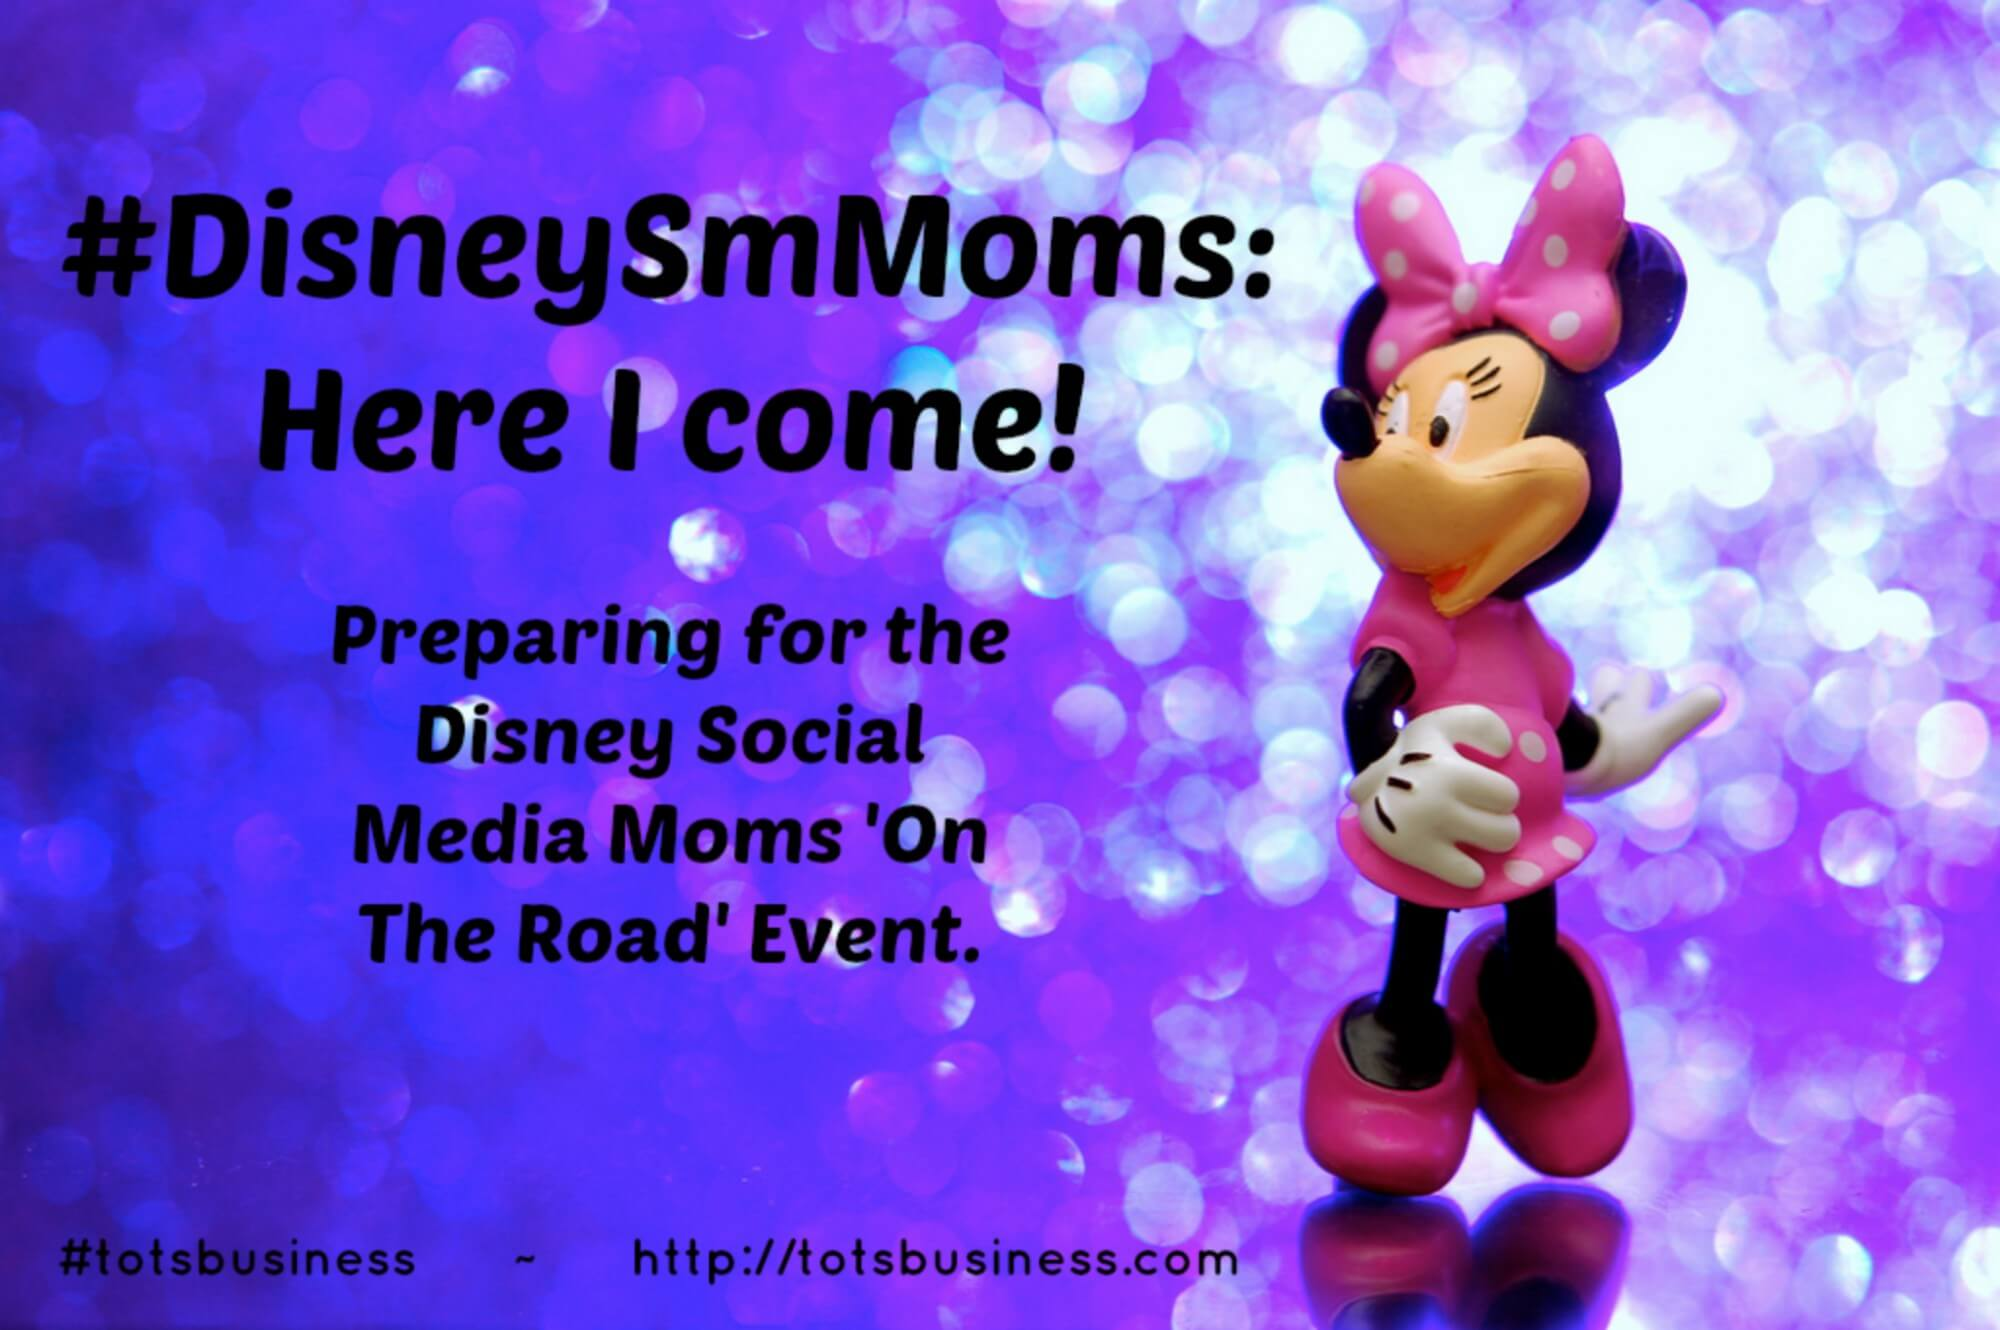 Thinking Outside The Sandbox: Business disney-smmoms1 Disney Social Media Moms: Here I Come! #DisneySMMoms All Posts Blogging  disney social media moms disney on the road disney boogie wipes blogging #disneysmmoms